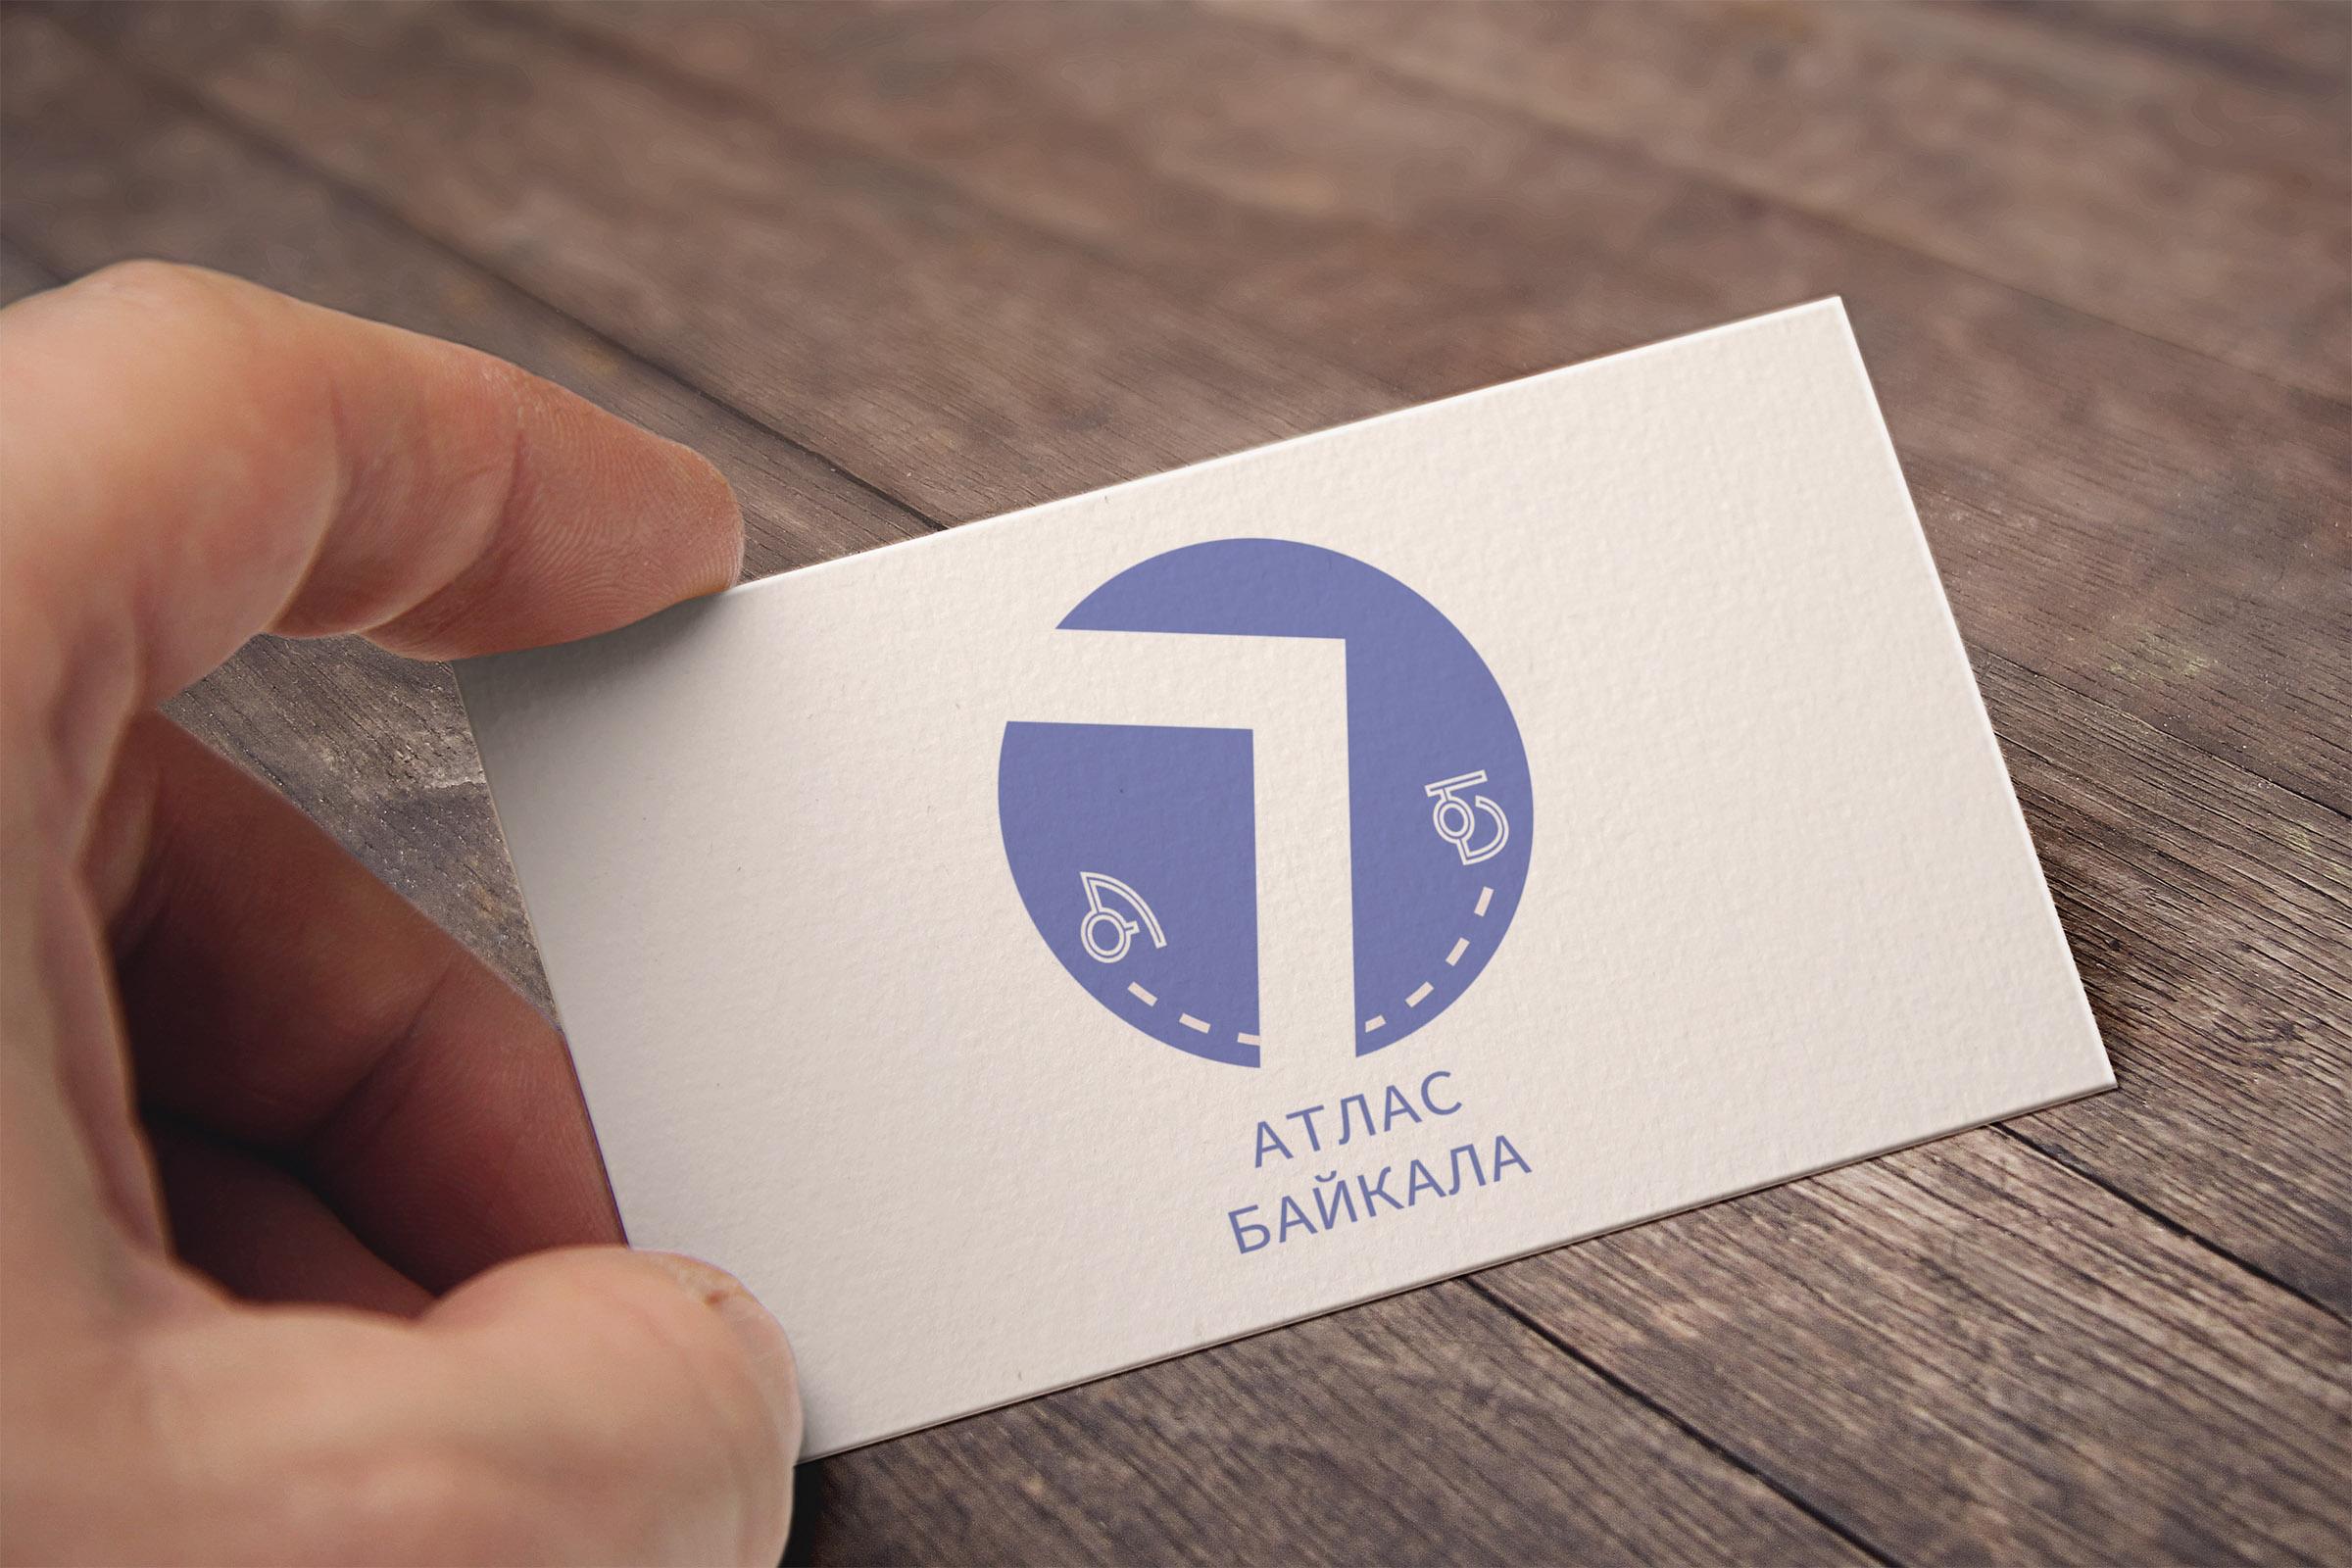 Разработка логотипа Атлас Байкала фото f_8345b1ad2bc10c84.jpg